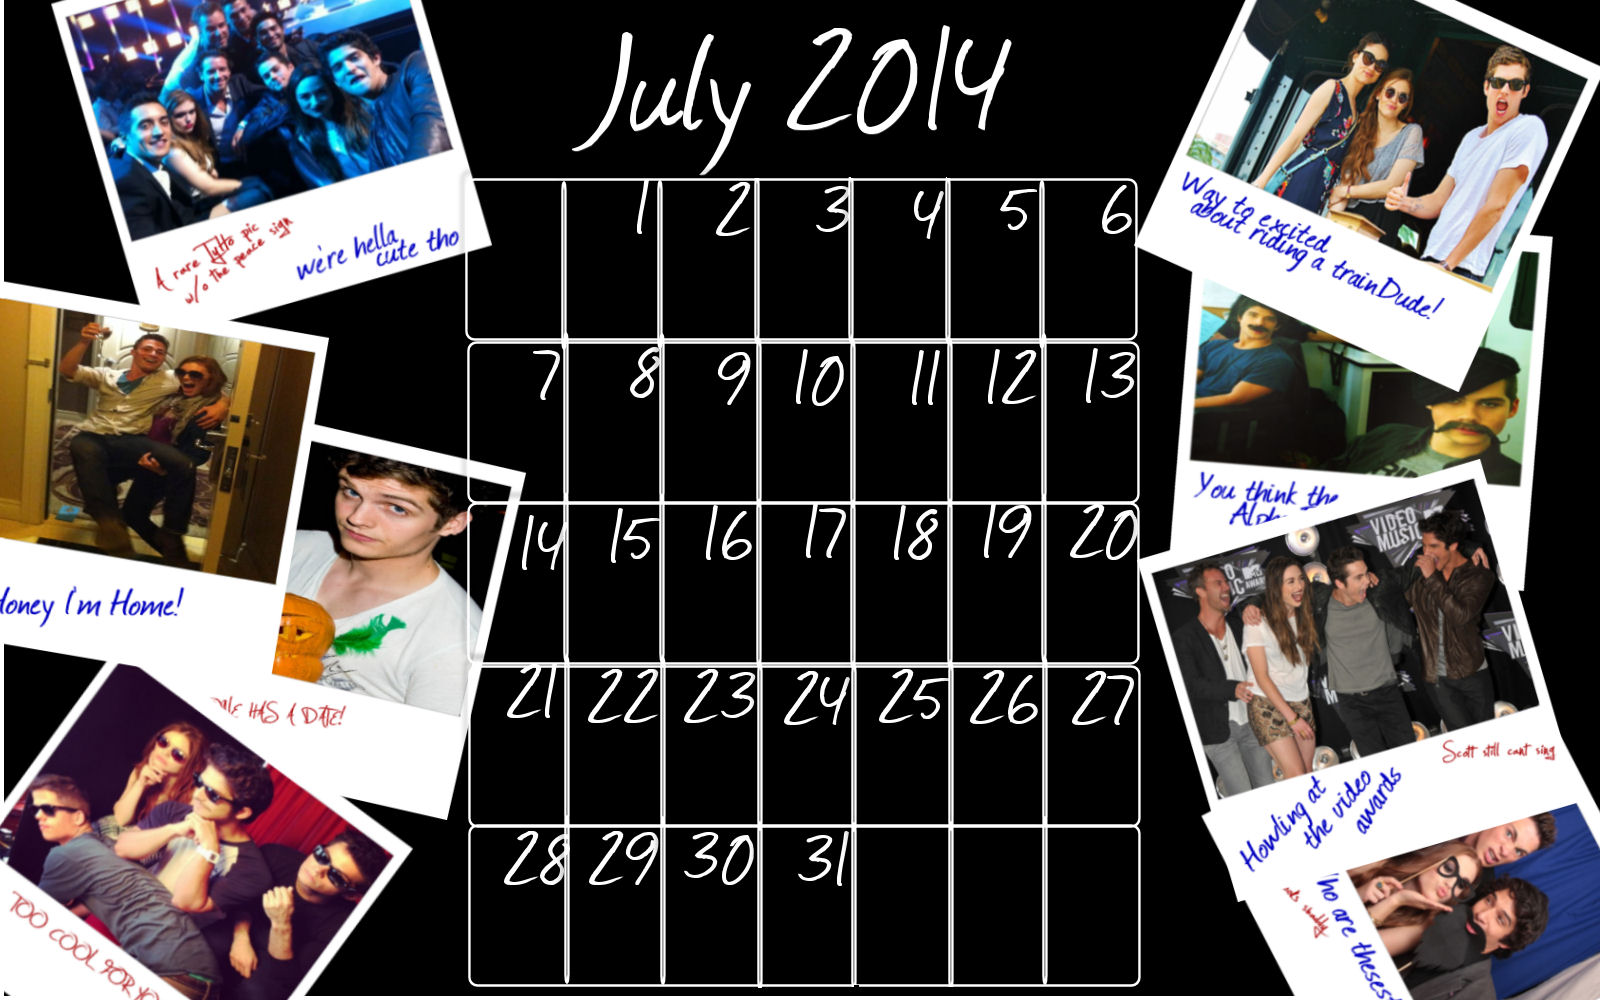 07.TW July